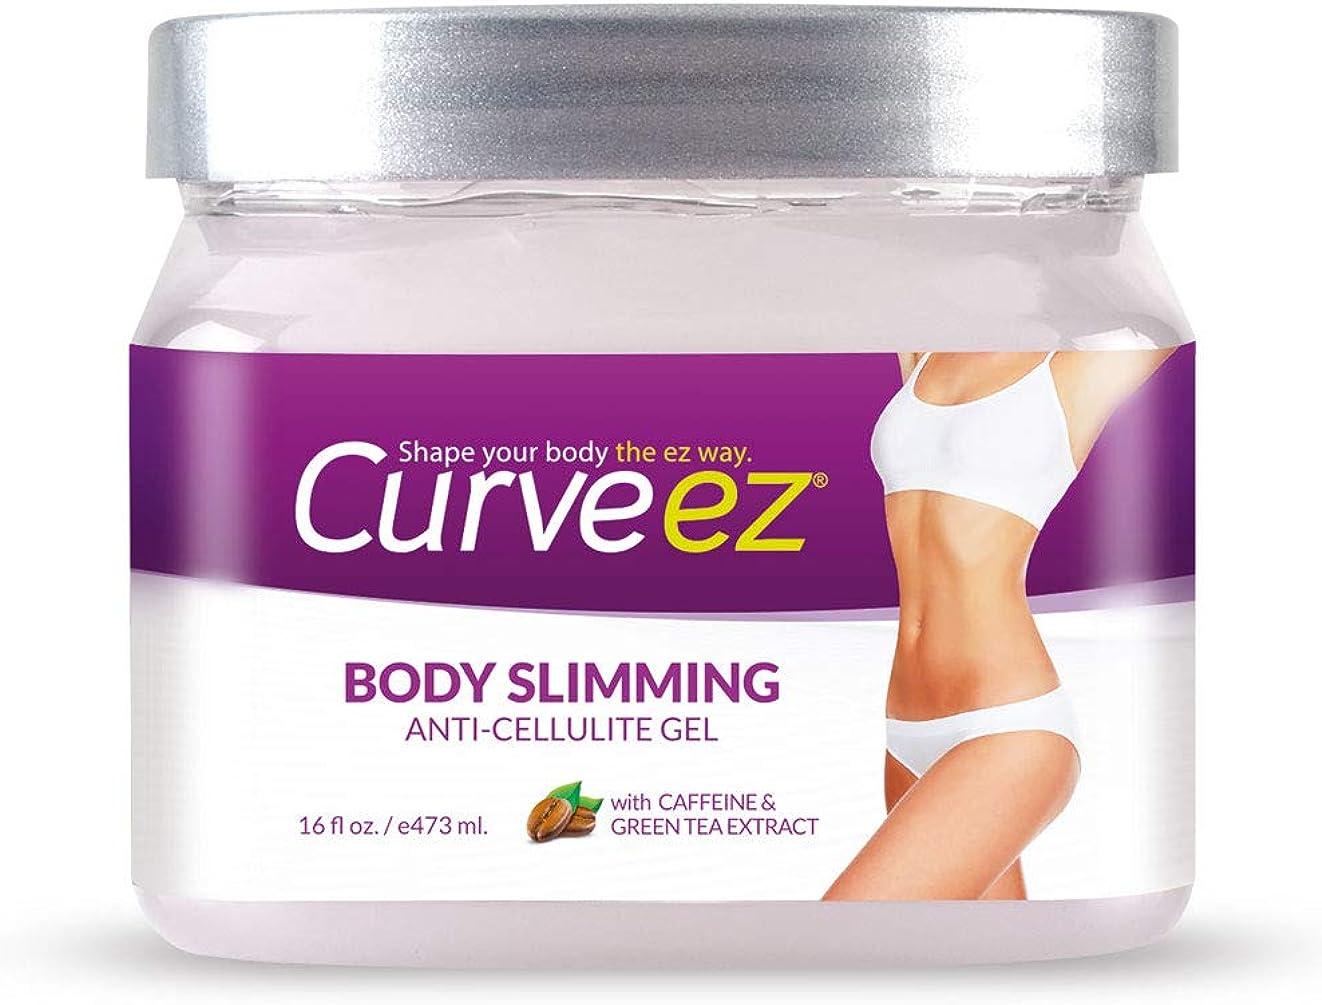 CURVEEZ Compression Bodysuit Butt and Tummy Shaper Fajas Levanta Cola